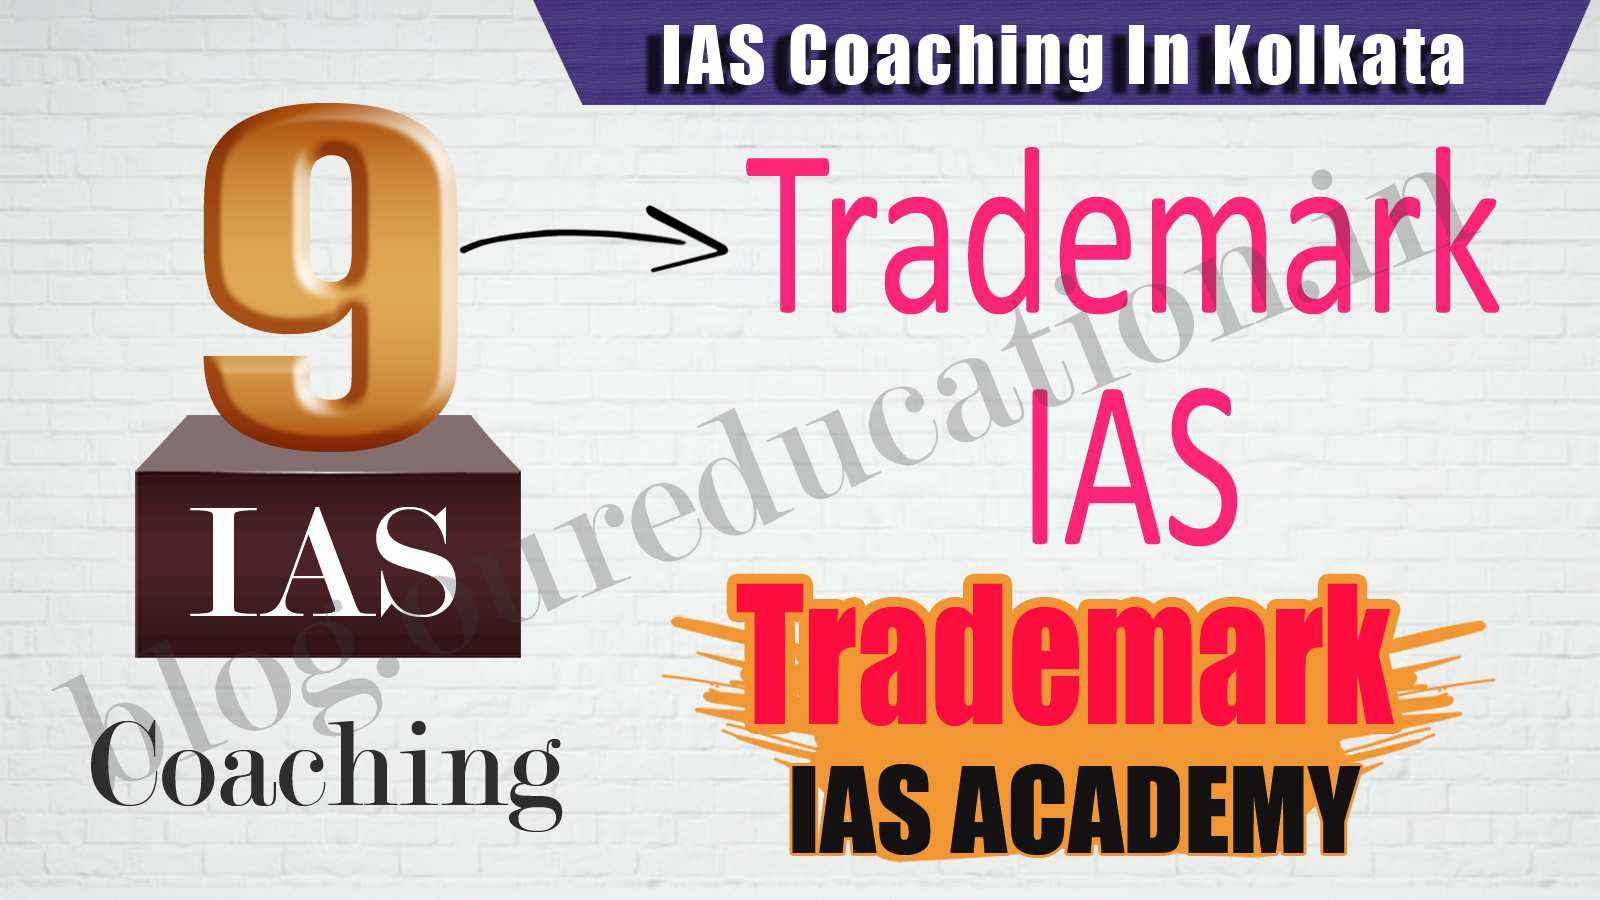 Top 10 IAS Coaching Institutes in Kolkata - UPSC Topper Strategy